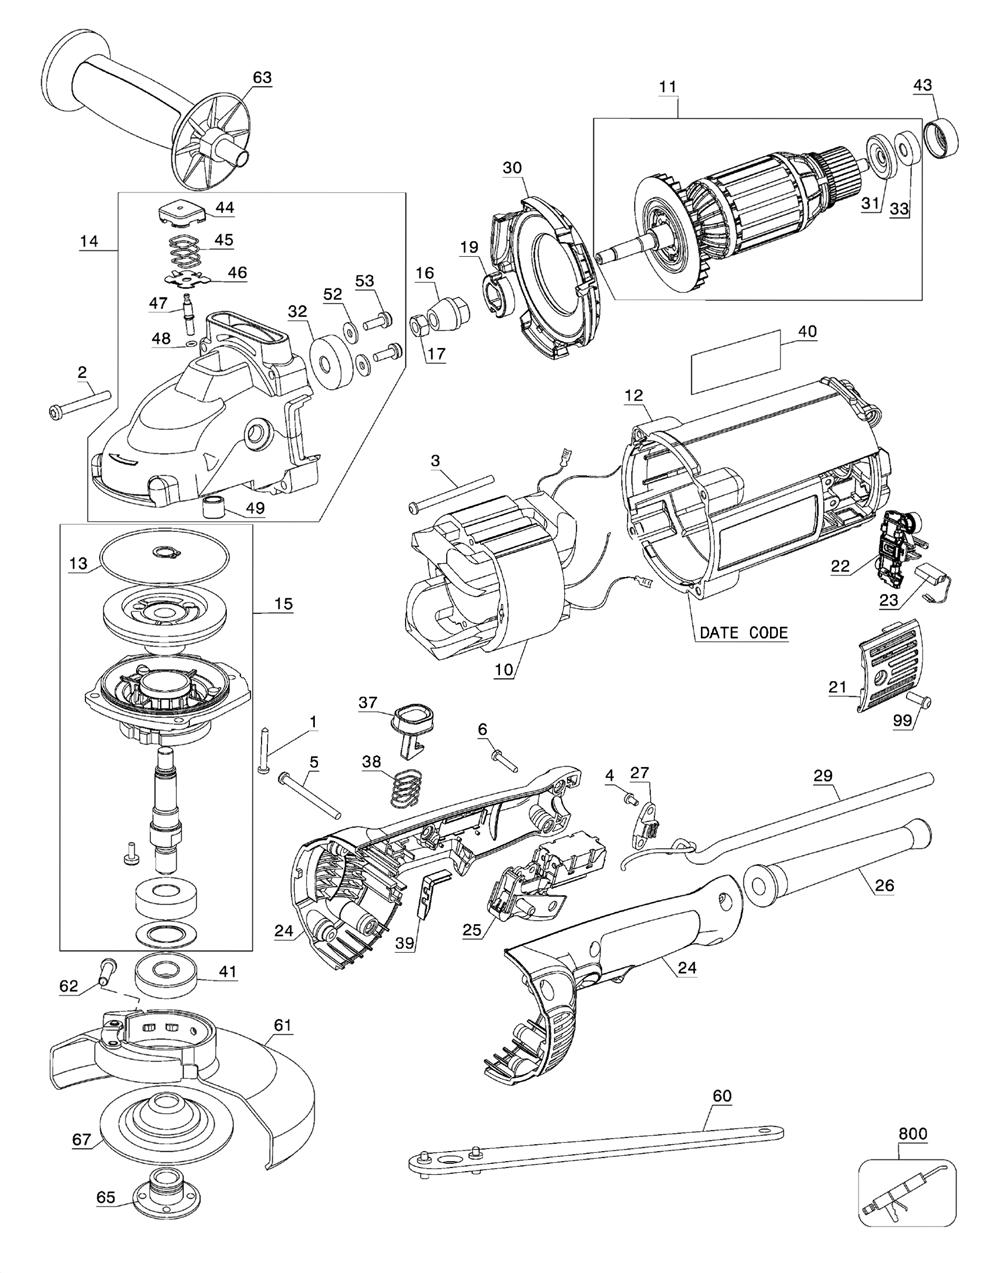 Buy Dewalt DWE4519 Type-5 9 Inch 6,500 rpm 4HP Angle